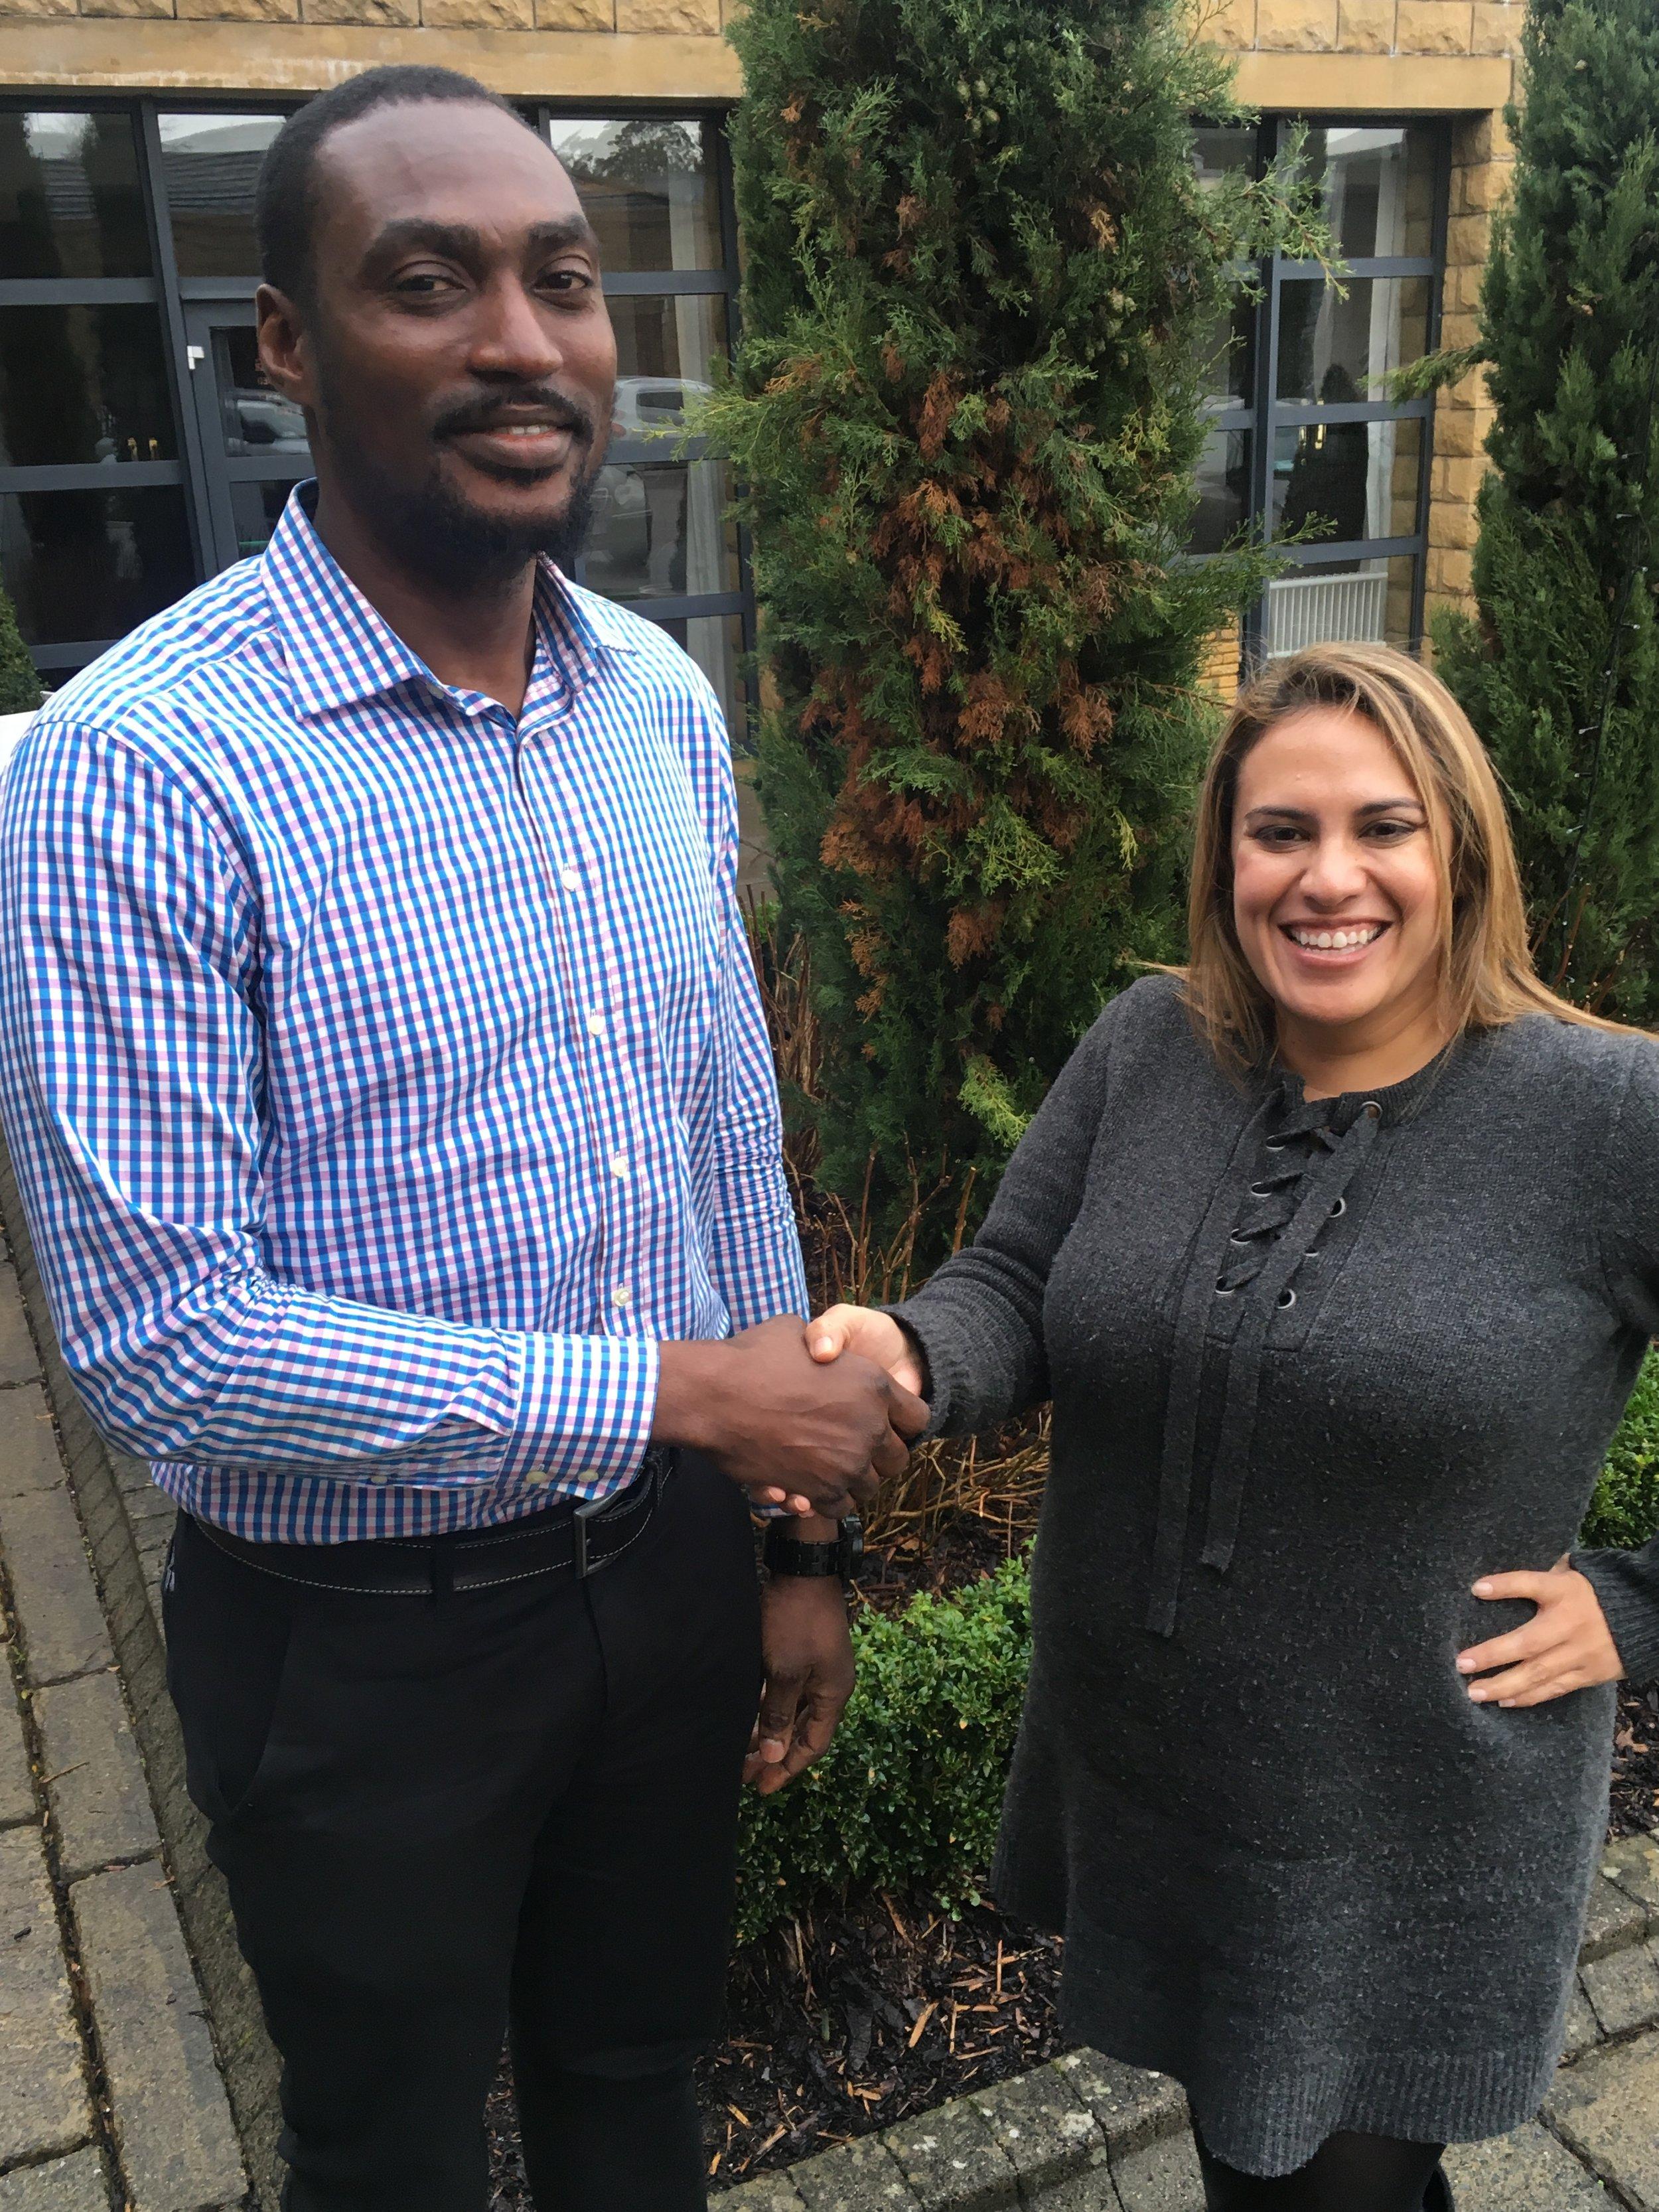 CEO Cori Calvert welcomes Ekene Gbanite to the team.